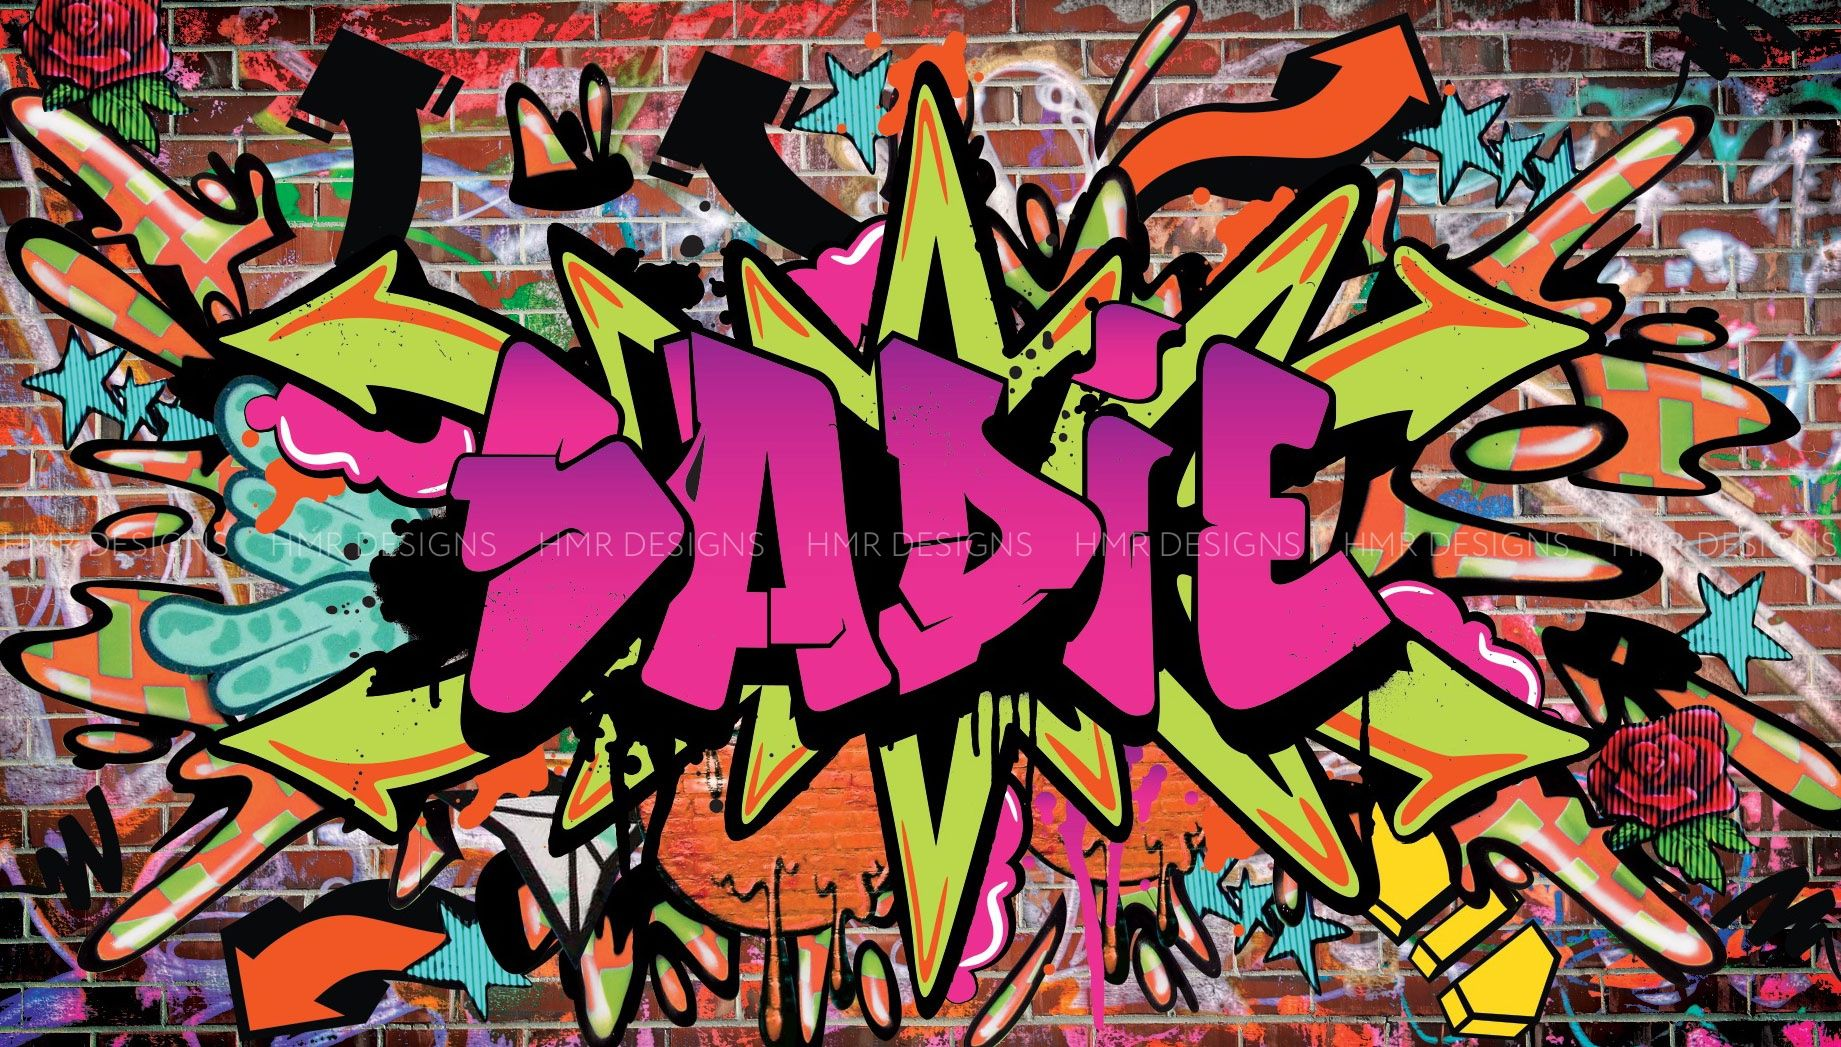 Graffiti Graphics | www.topsimages.com